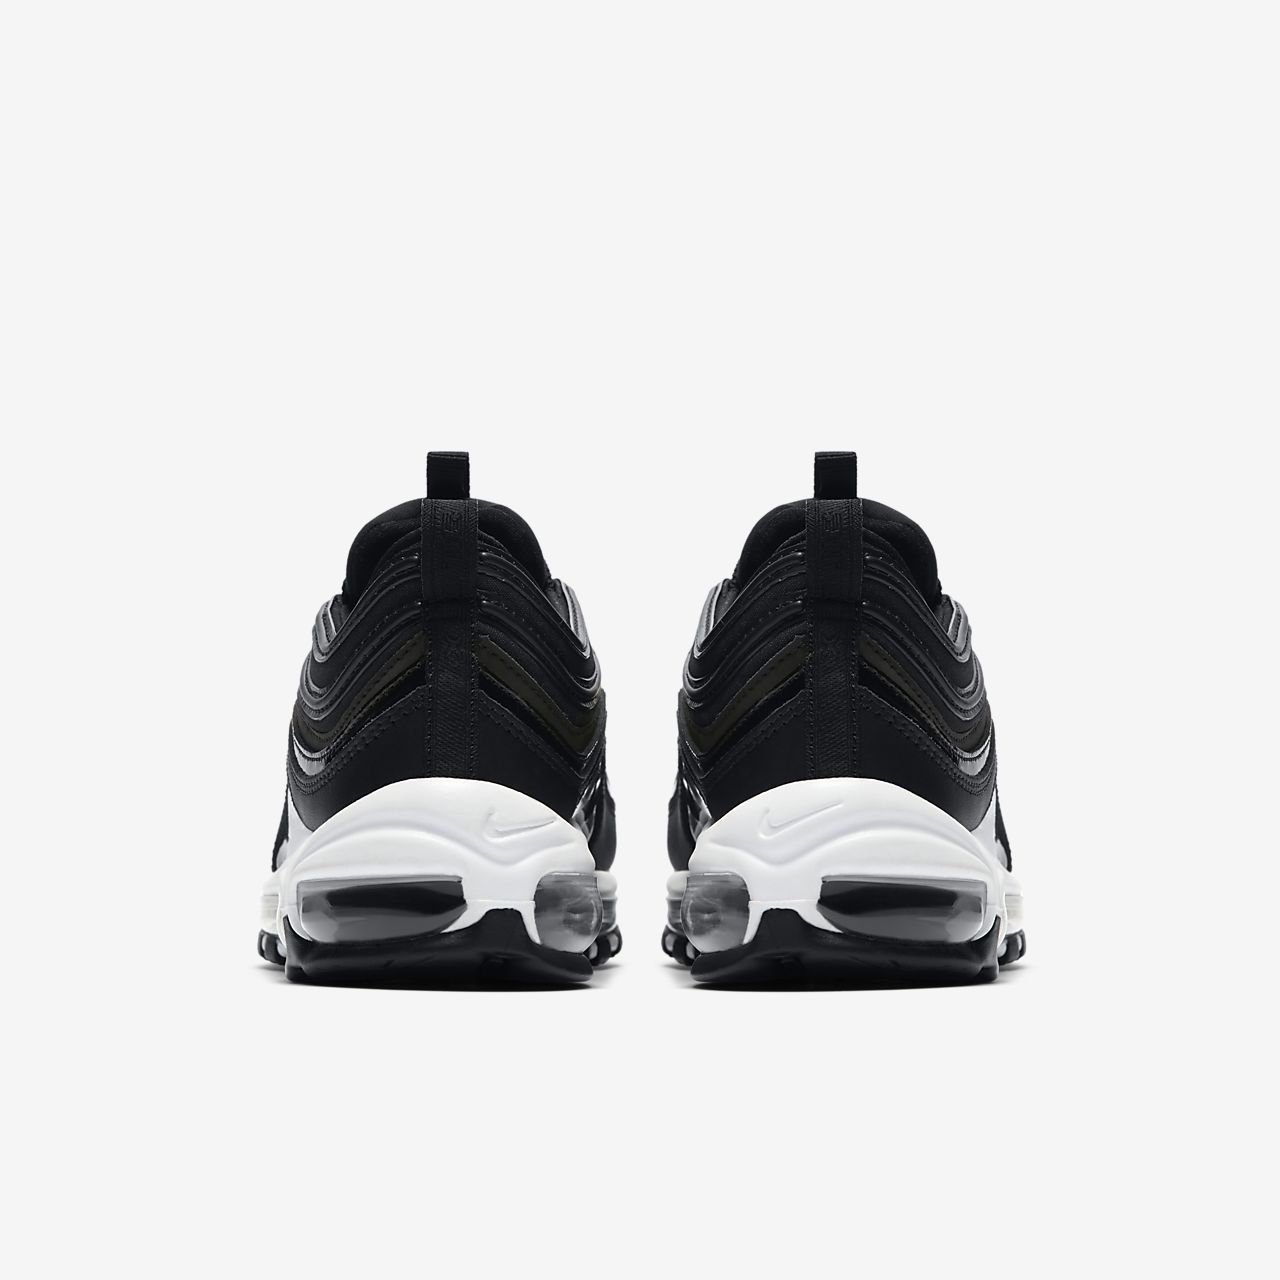 Női Nike Air Max 97 Premium Utcai Cipő Sötét Szürke Fekete ... 6def4a4264